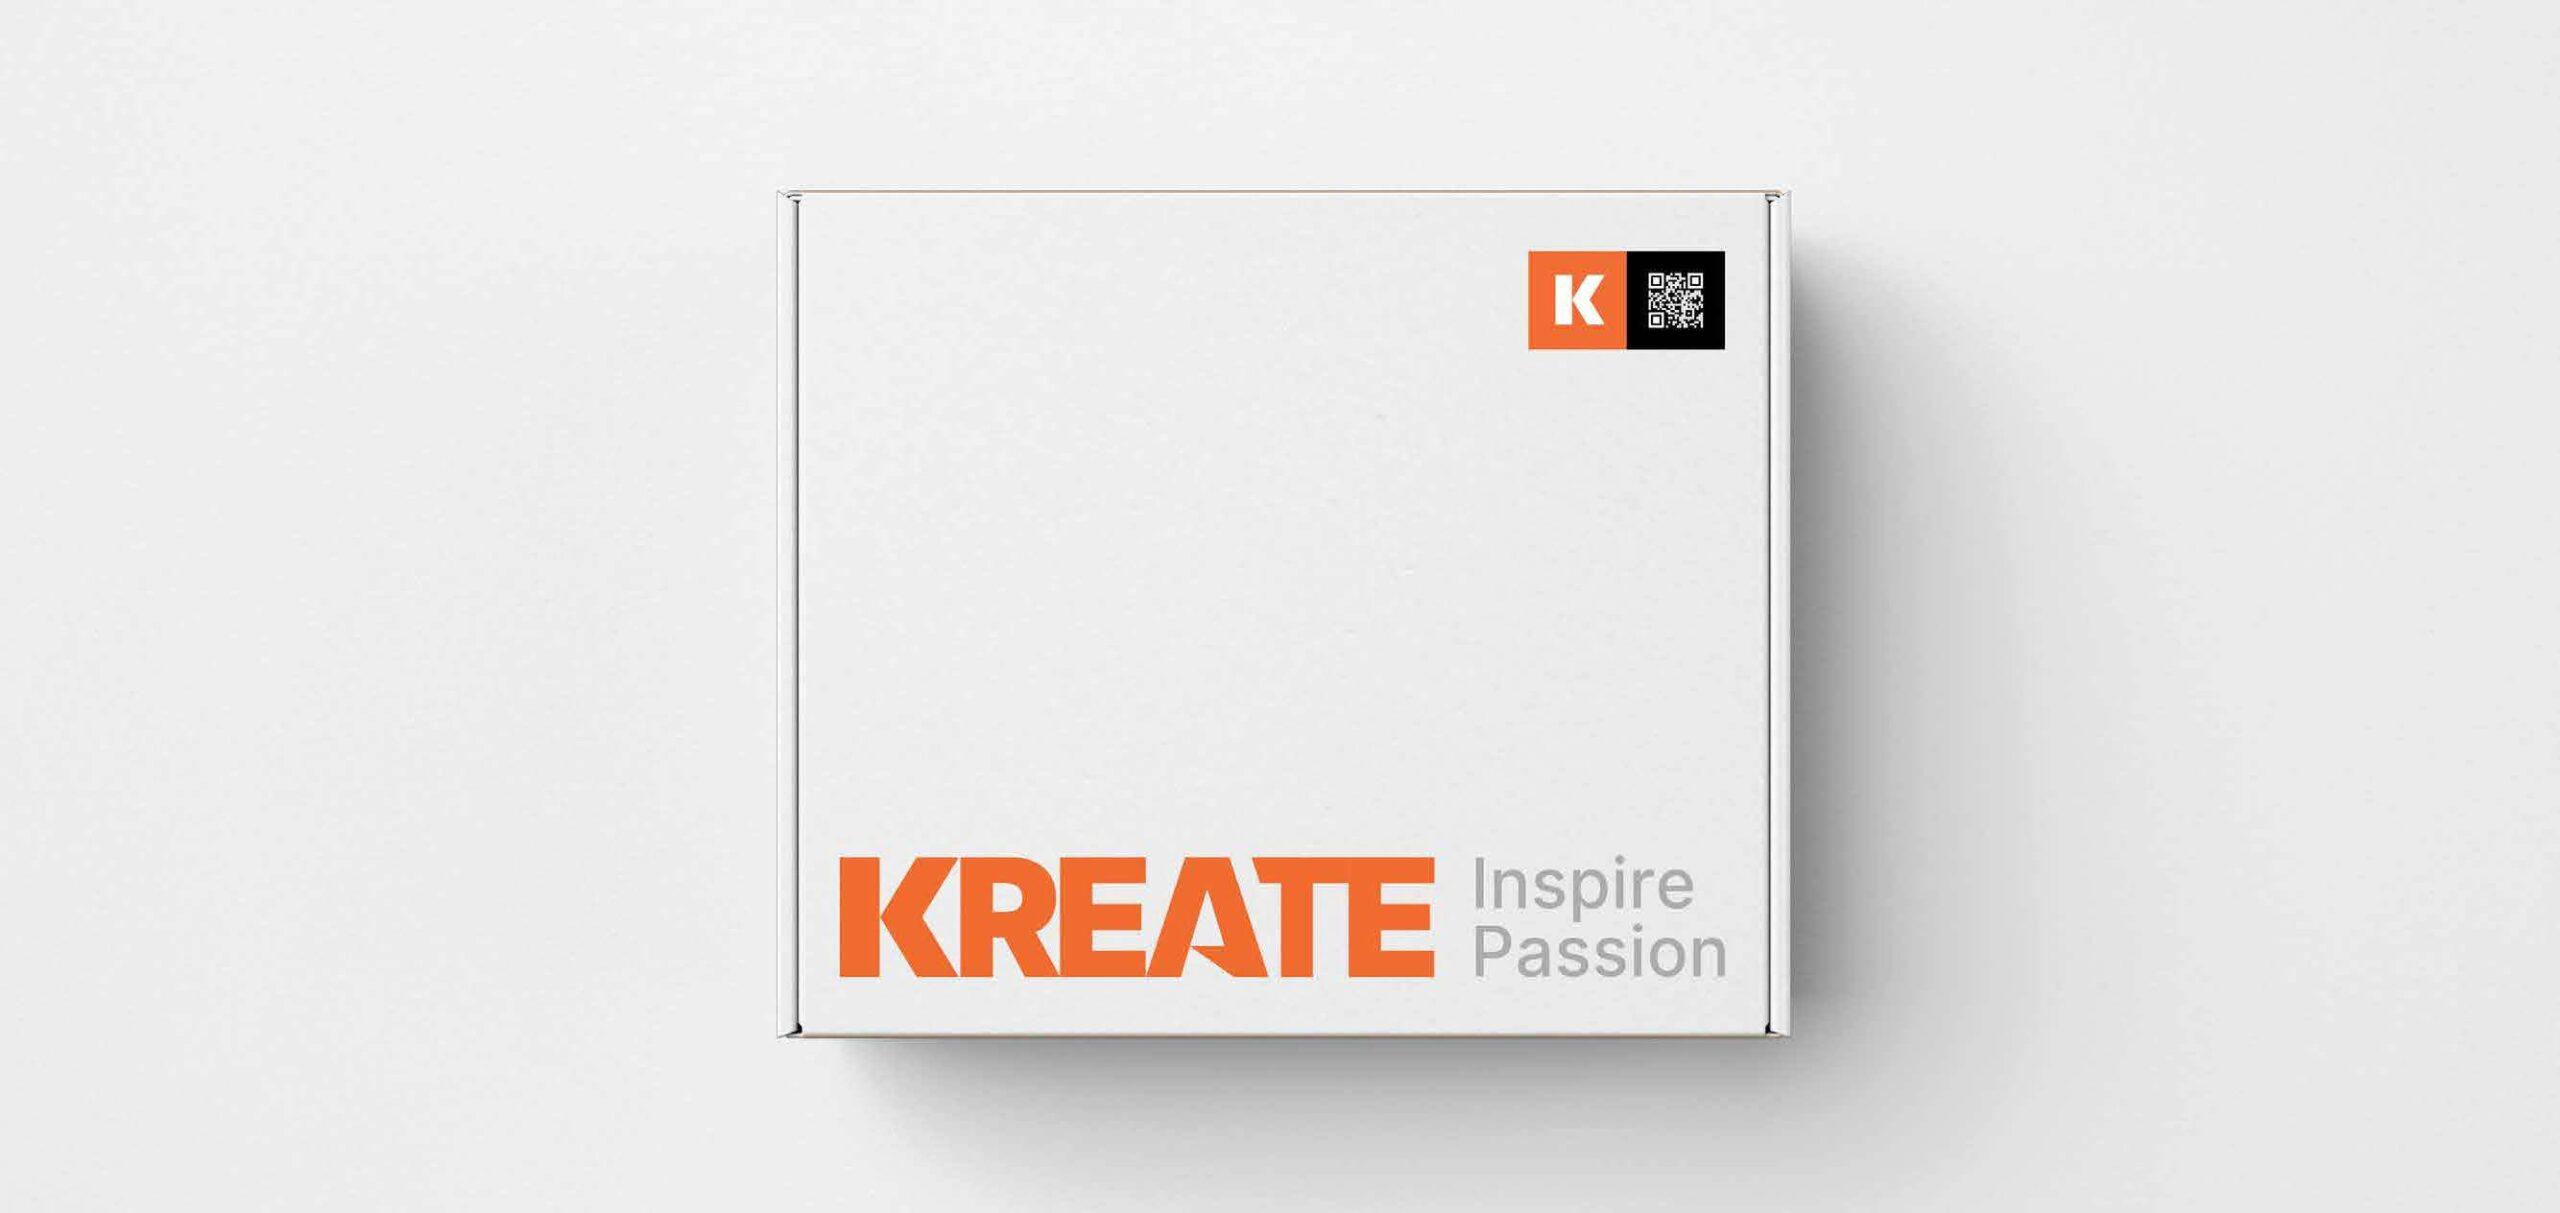 bdsapteltd_projects_kreate_branding-e-scaled.jpg